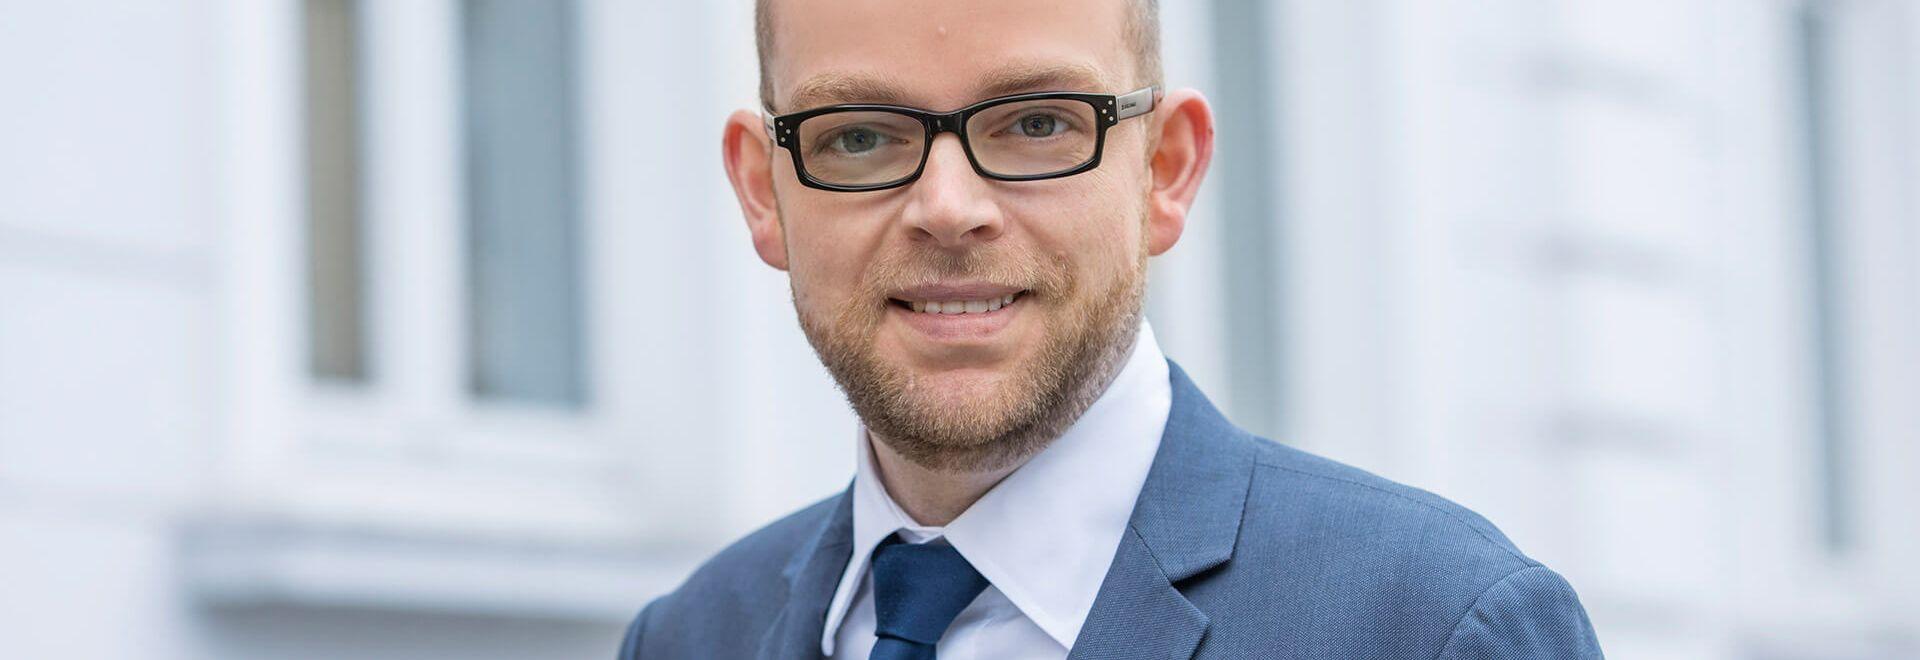 Rechtsanwalt Christopher Bartel